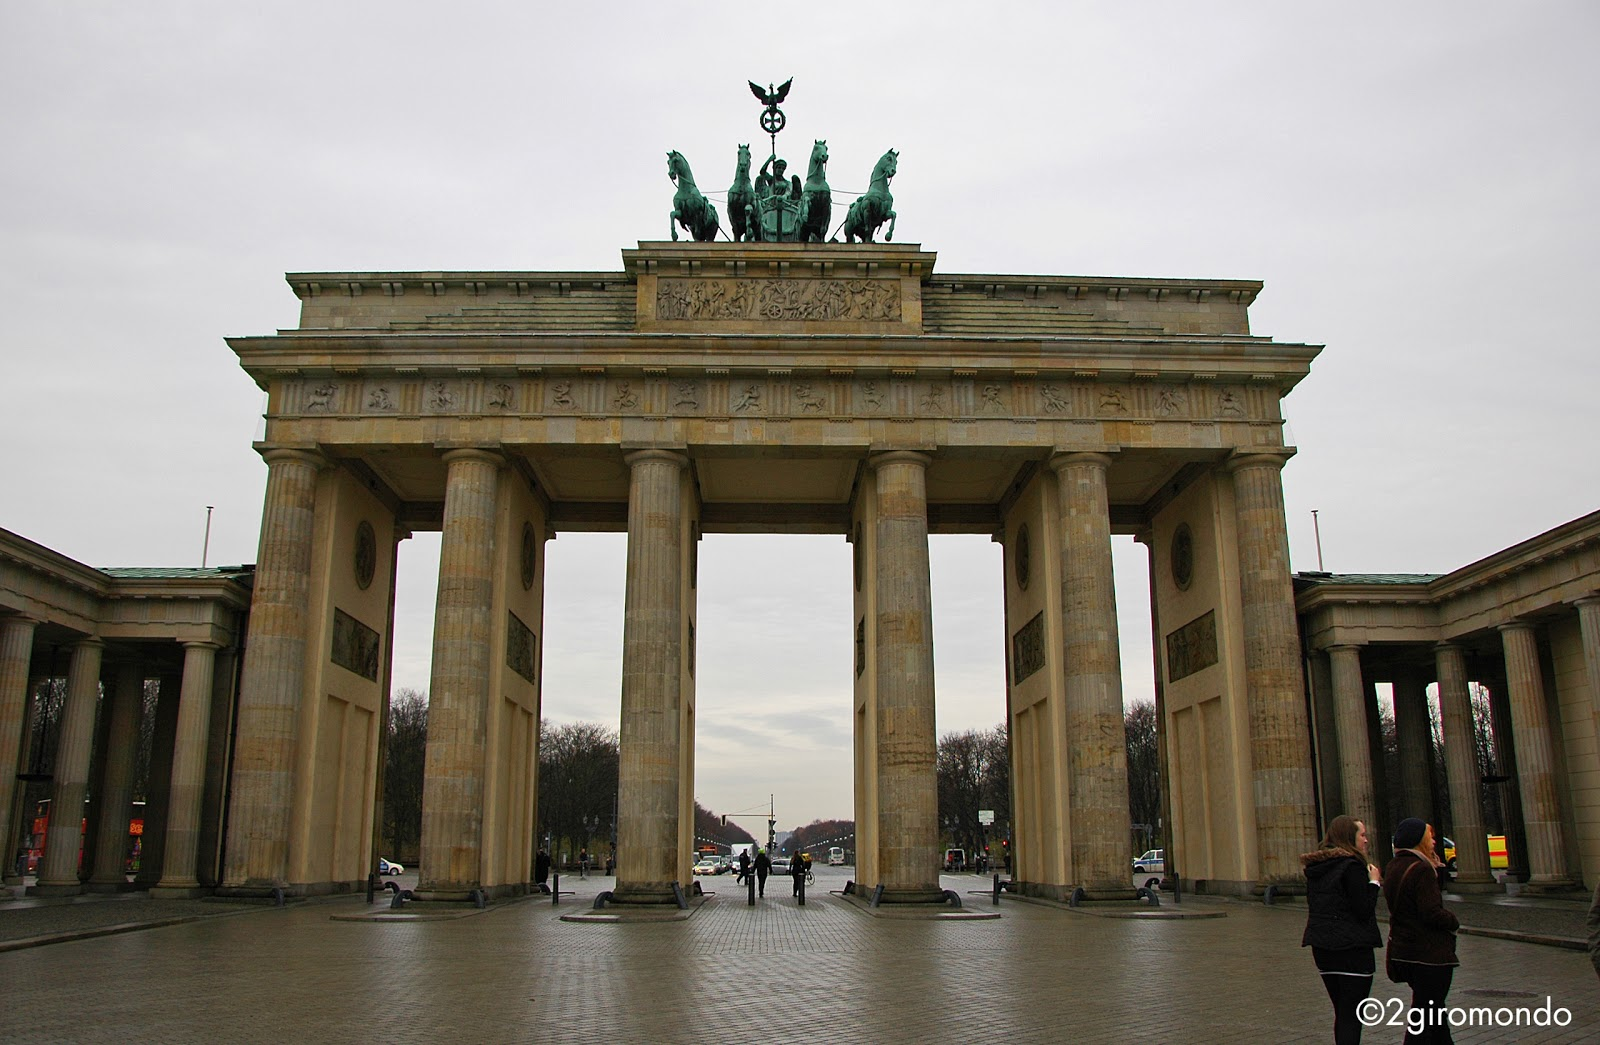 2giromondo top 5 di berlino - Berlino porta di brandeburgo ...